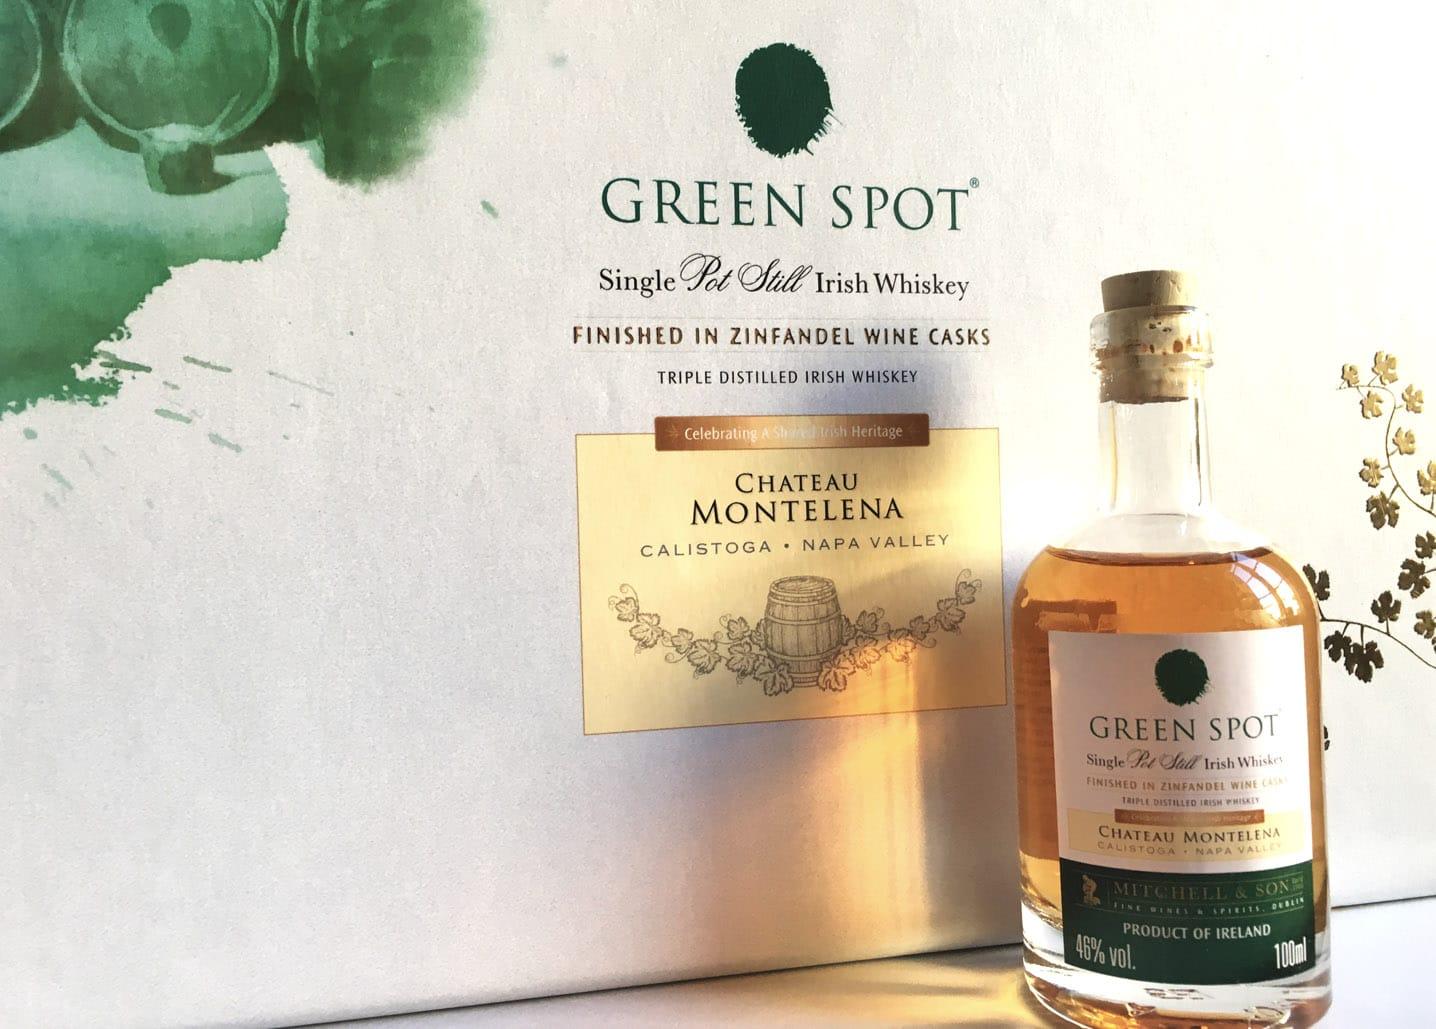 Green Spot Chateau Montelena - Todo Whisky